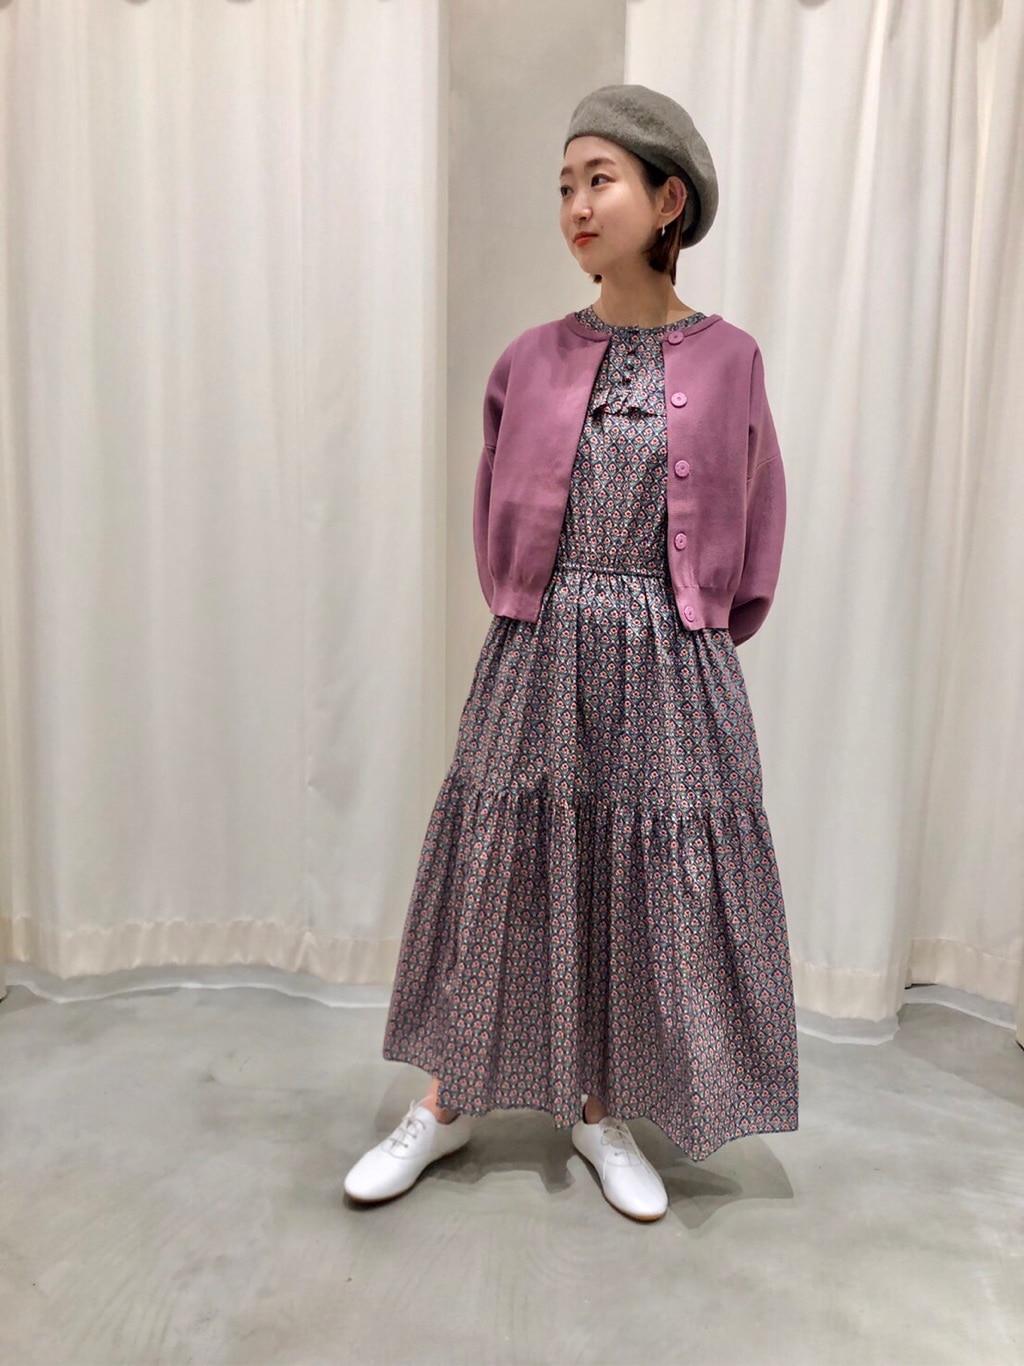 CHILD WOMAN , PAR ICI 東京スカイツリータウン・ソラマチ 2020.10.01